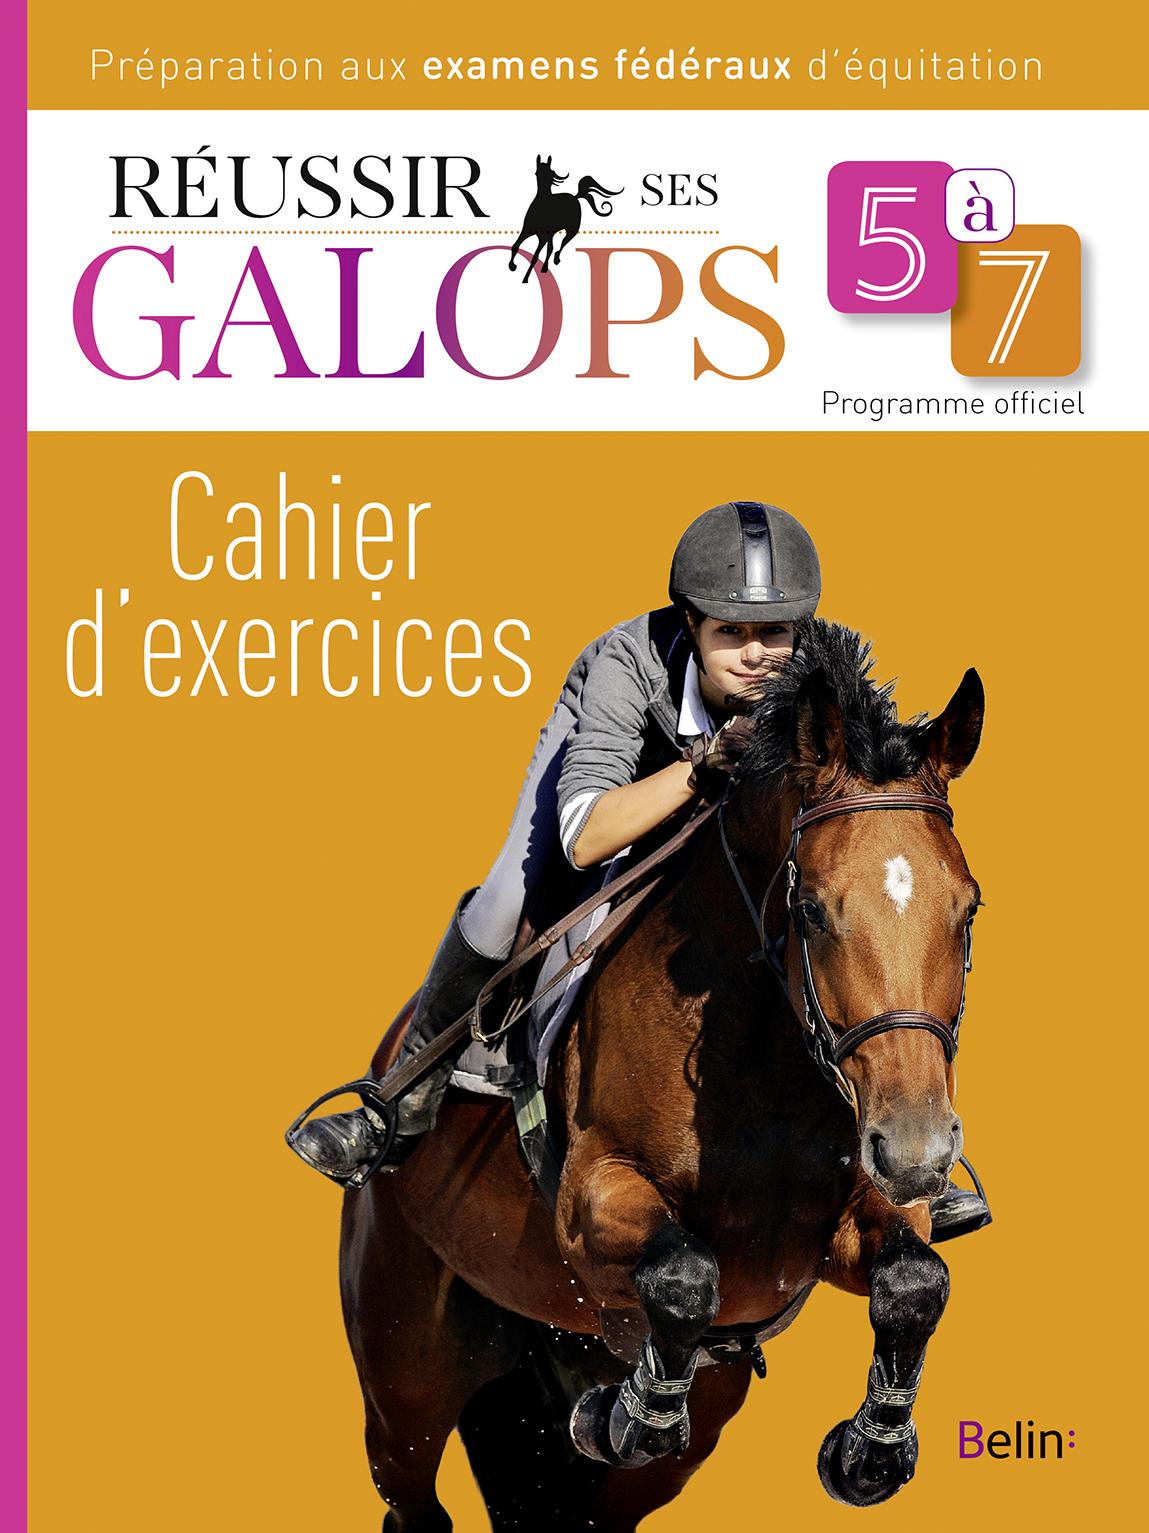 REUSSIR SES GALOPS 5 A 7 (CAHIER D'EXERCICES)